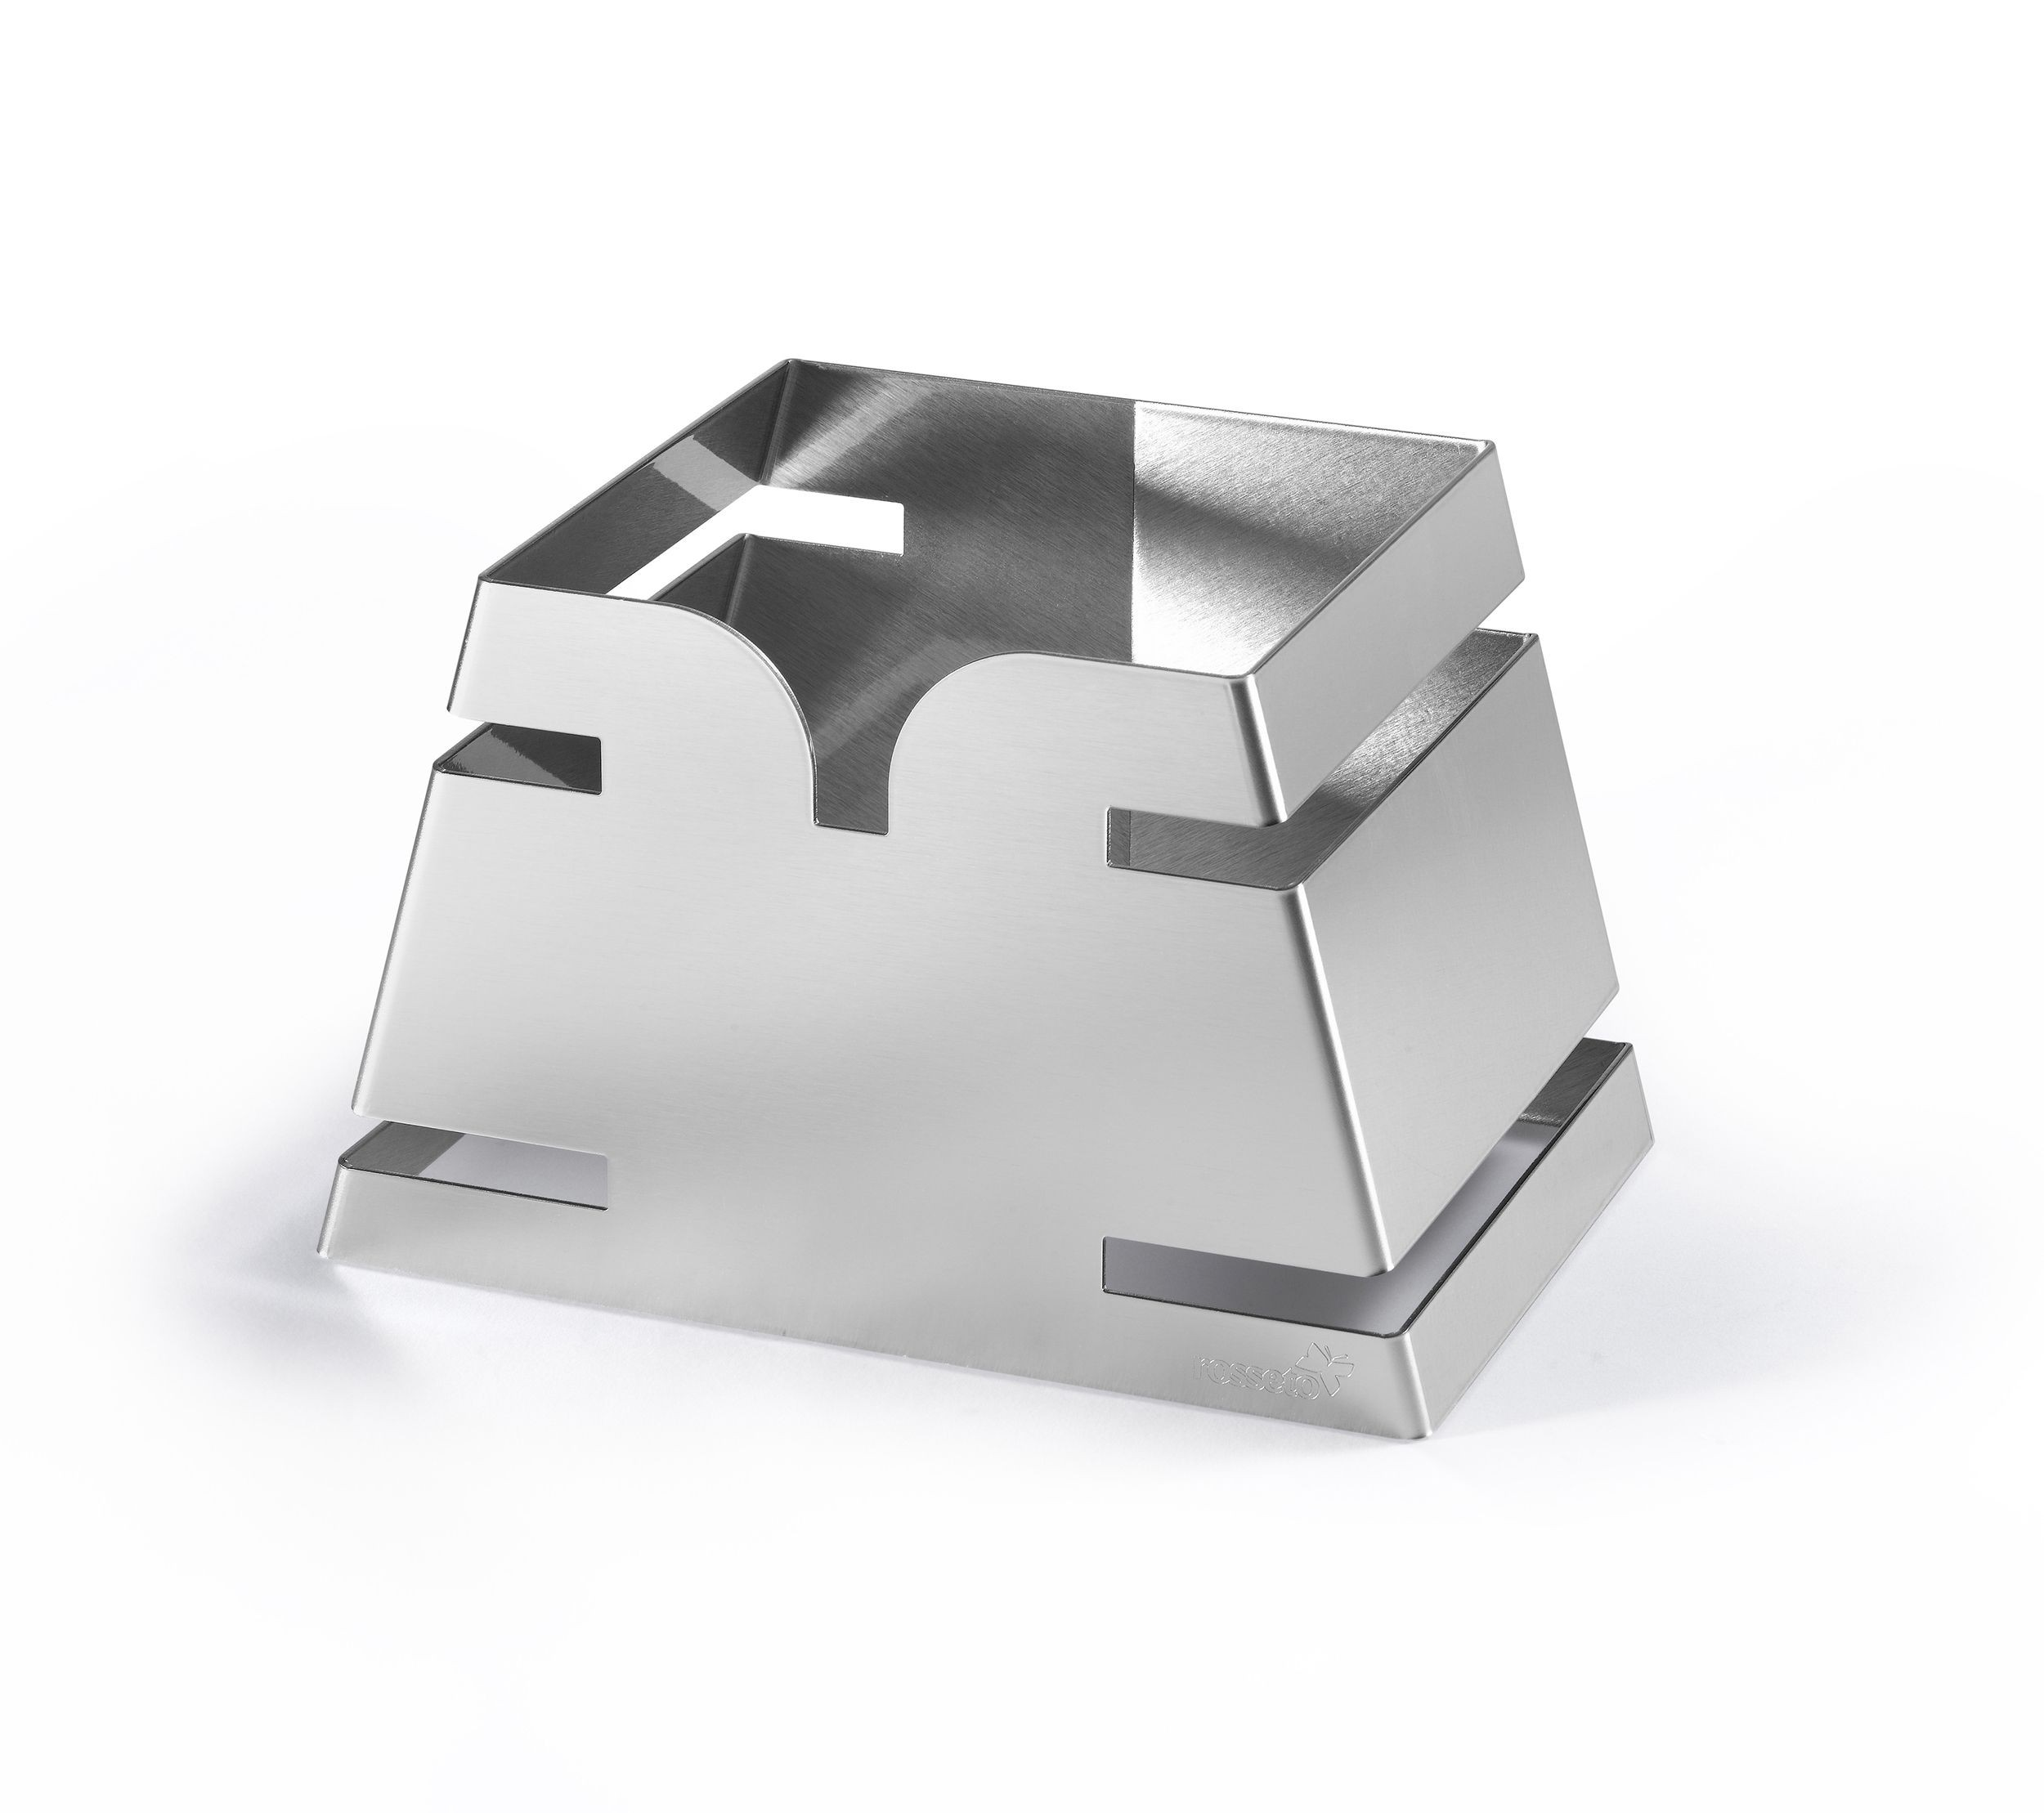 "Rosseto LD137 Small Pyramid Stainless Steel Skycap Riser 10.35"" x 7"" x 6.5""H"